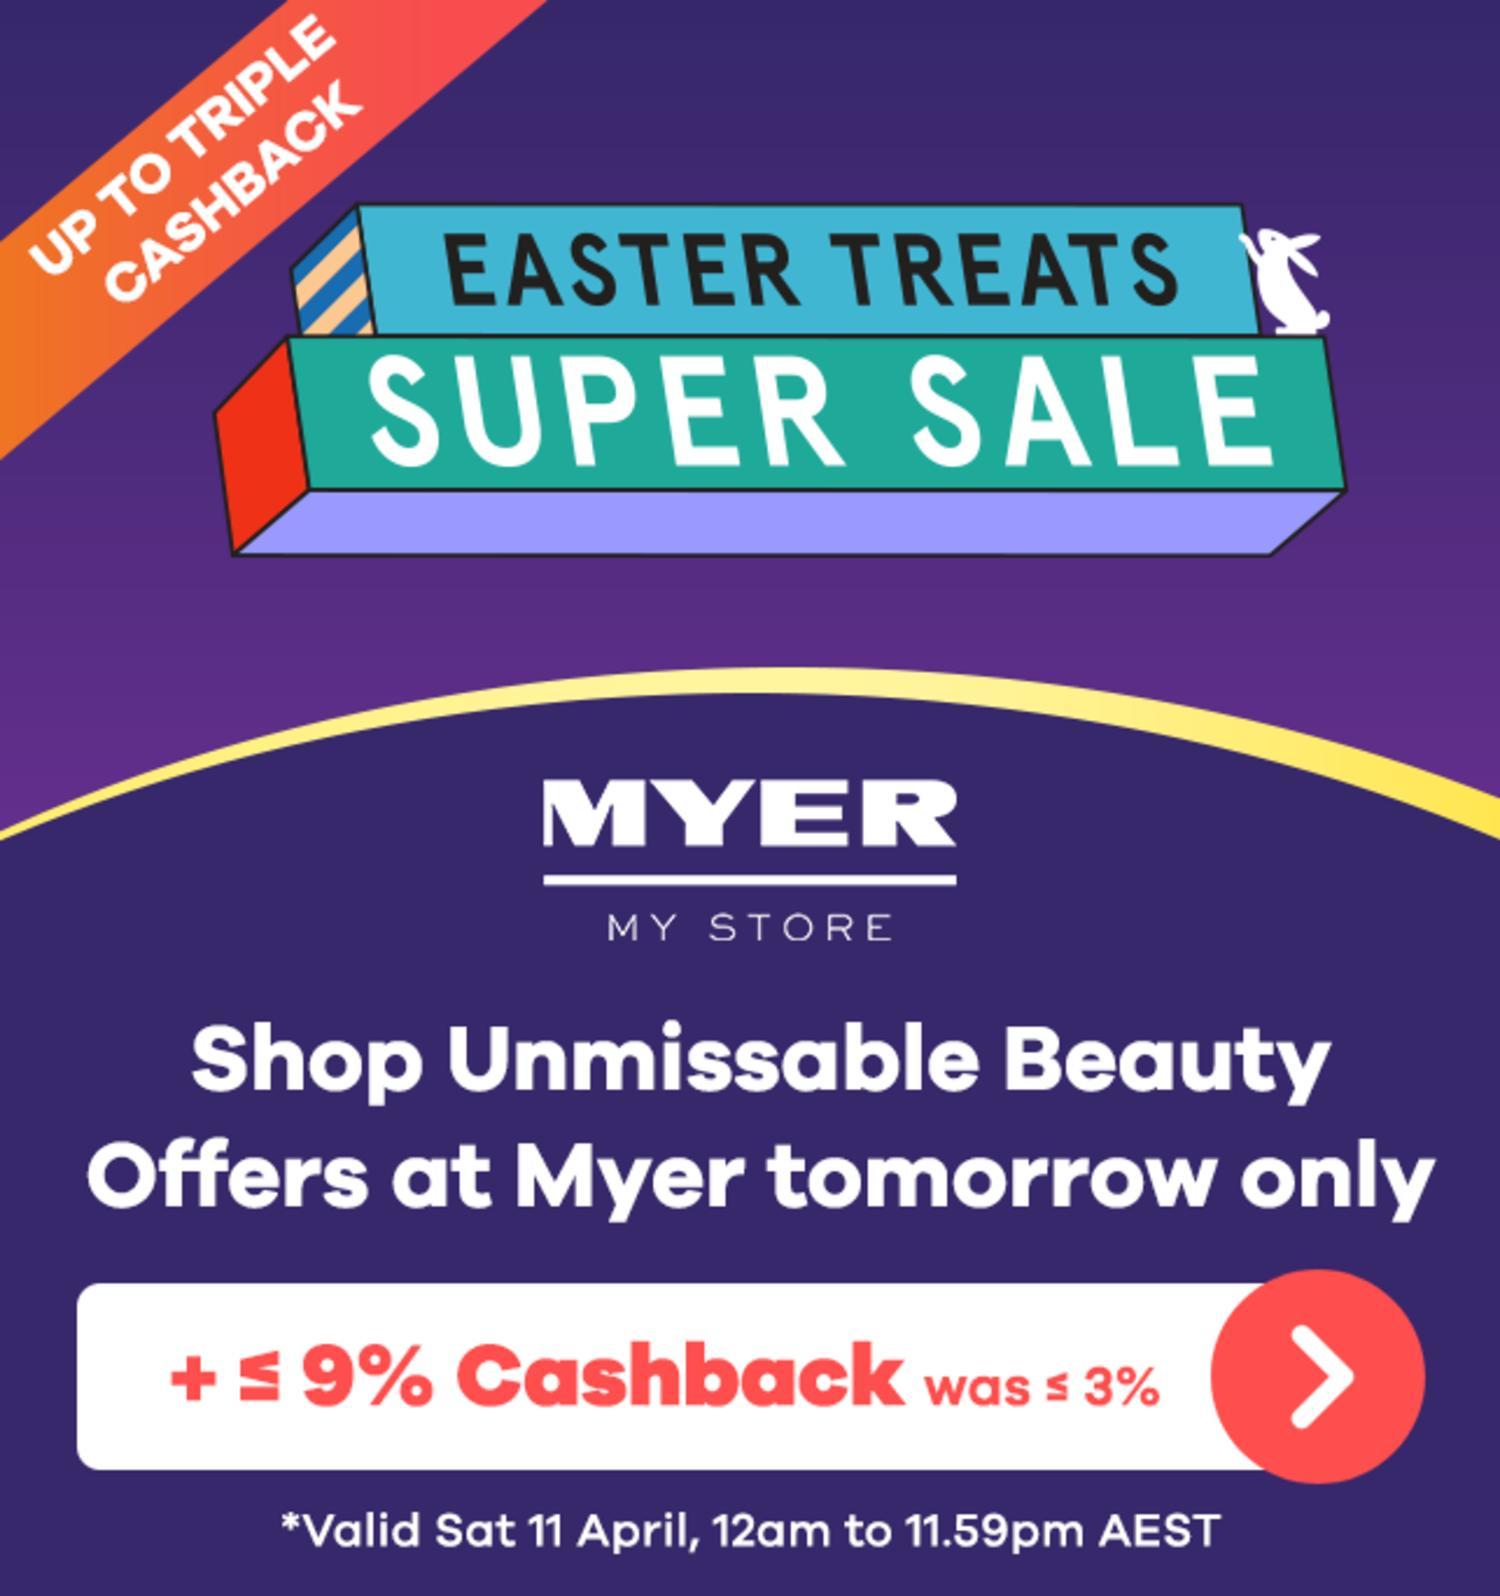 Myer - Easter Sale Teaser